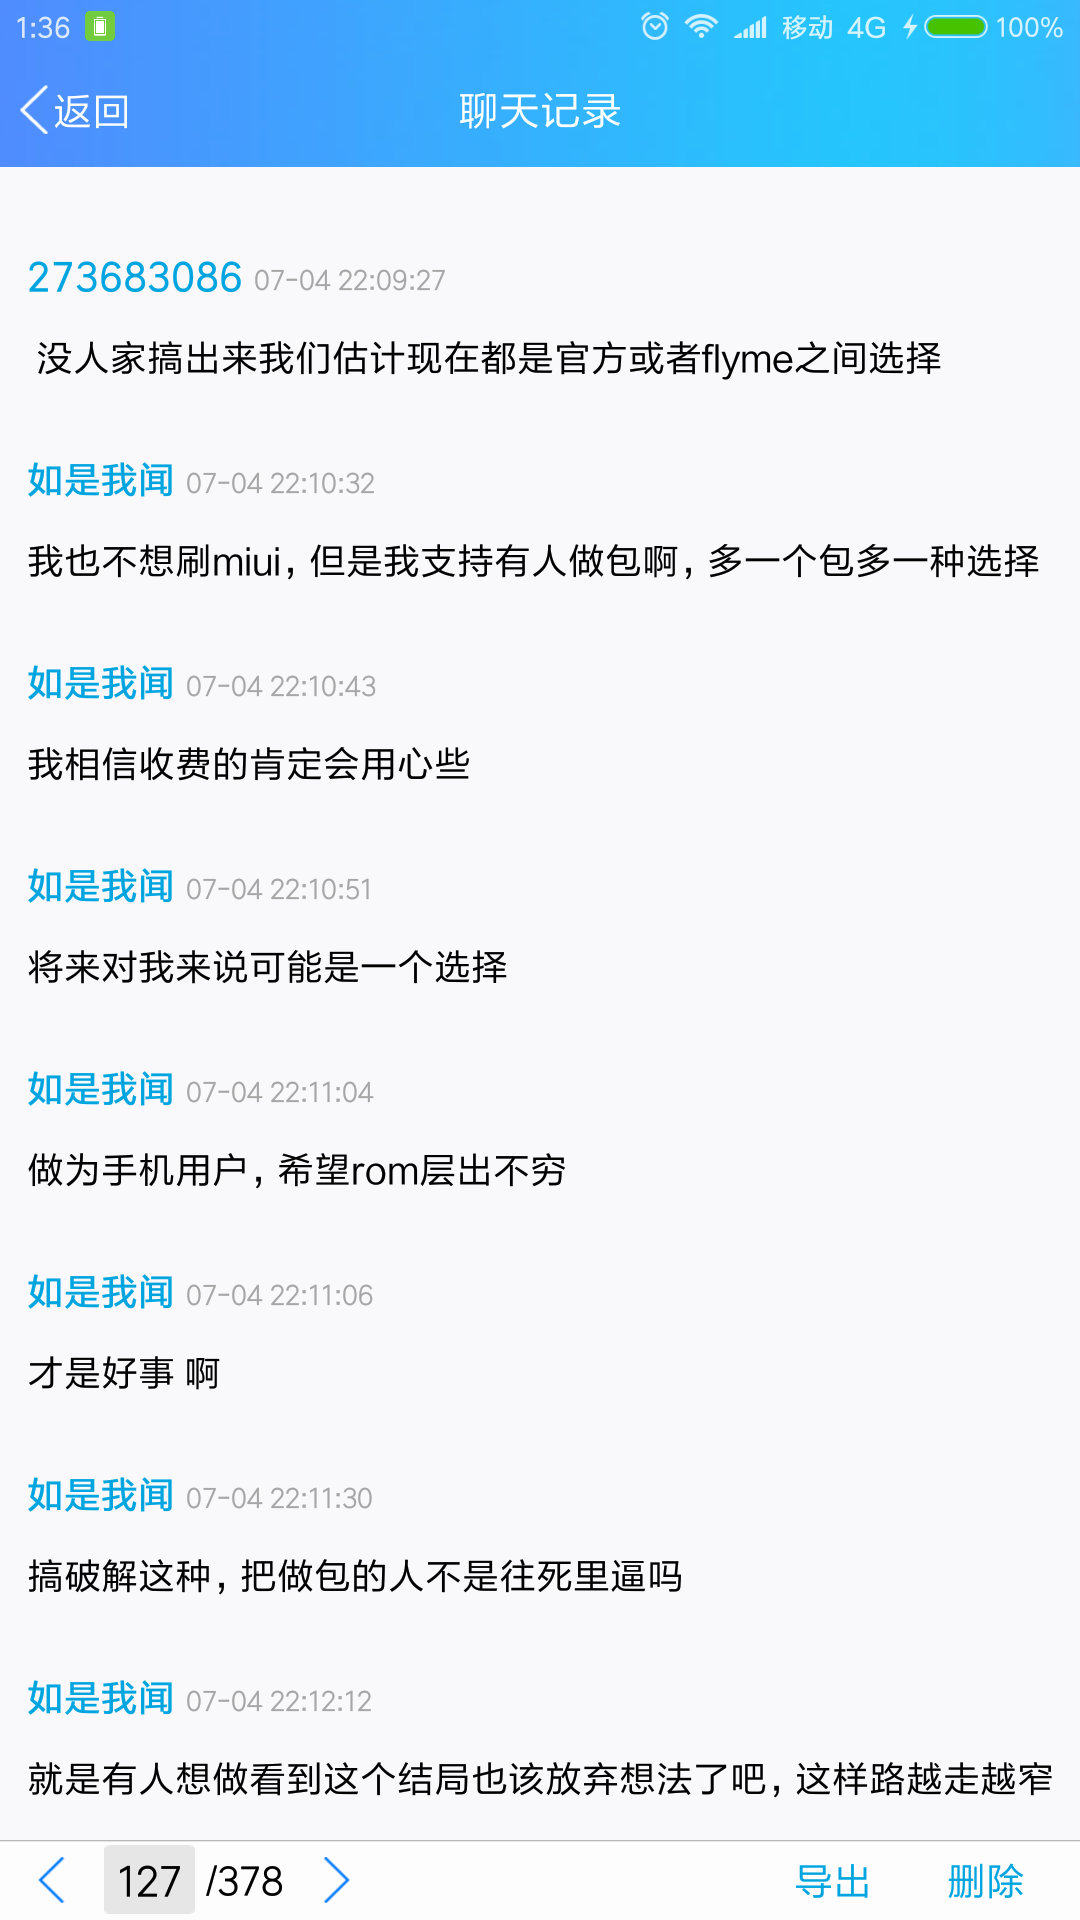 Screenshot_2017-07-09-01-36-12-147_com.tencent.mobileqq.png